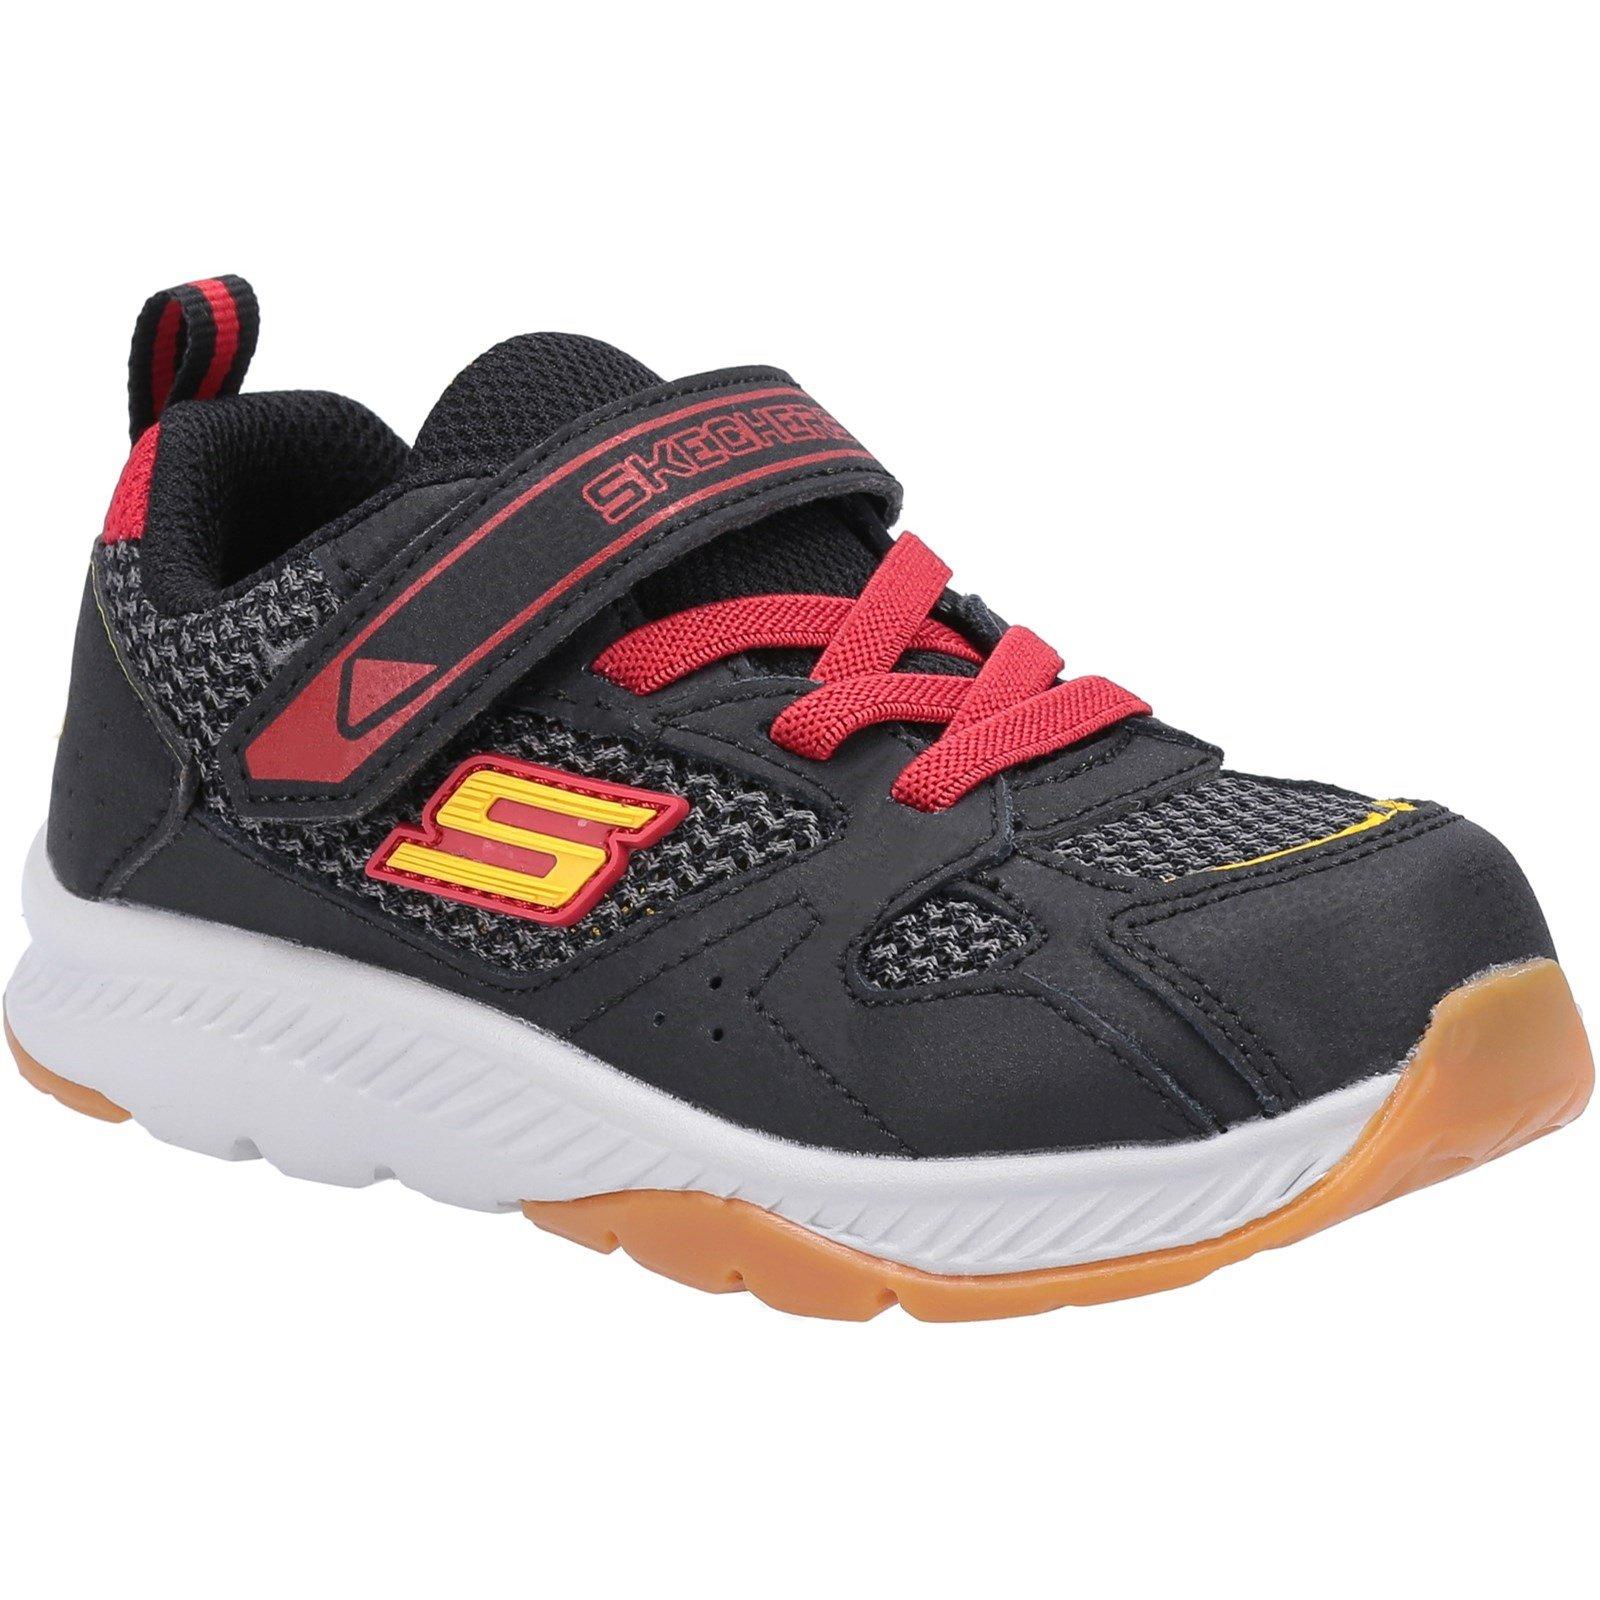 Skechers Kid's Comfy Grip Trainer Multicolor 30424 - Black/Red 9